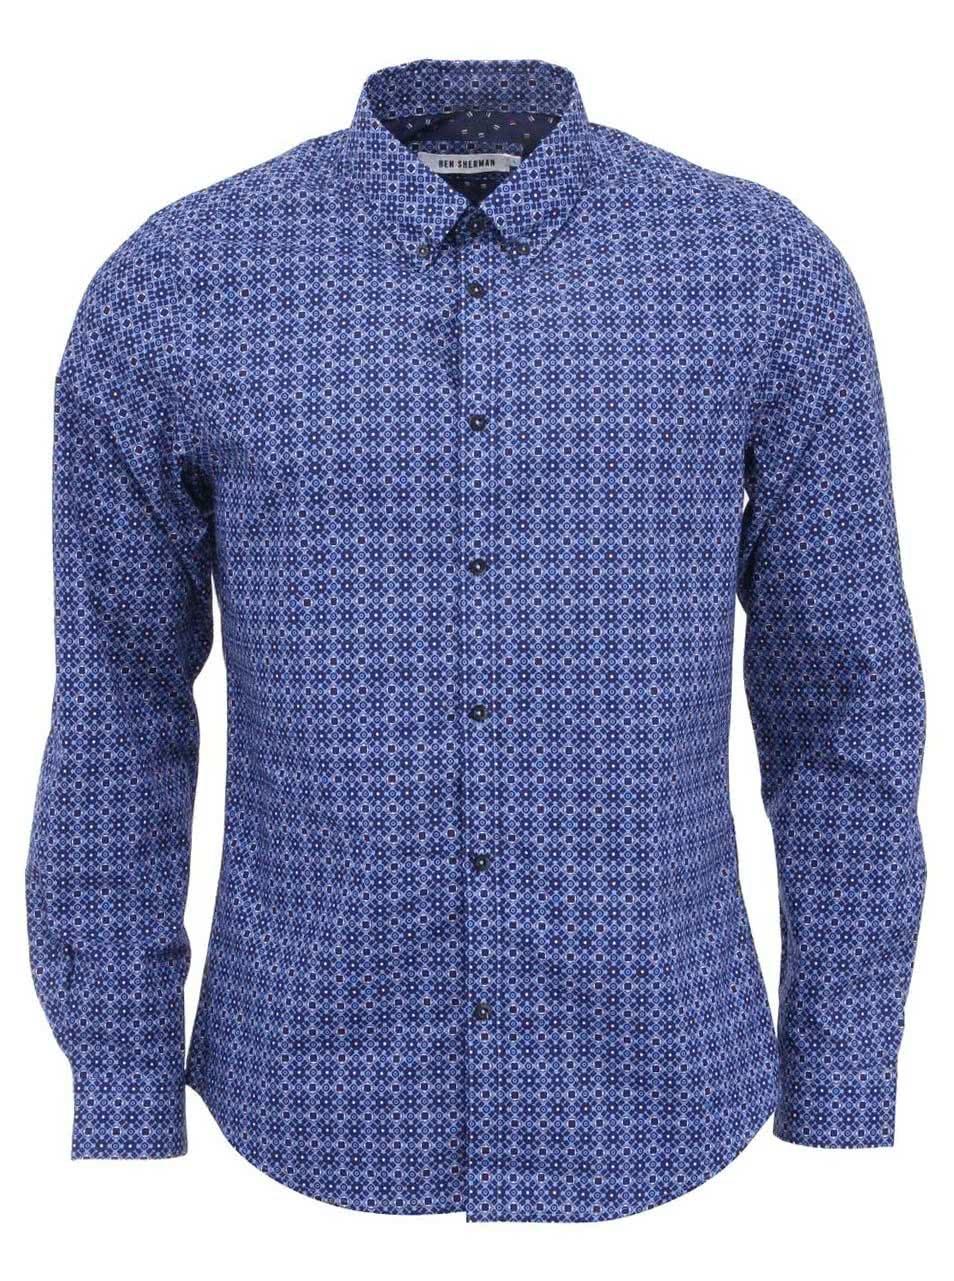 bdb8a5fbda0 Bílá košile bez límečku Burton Menswear London